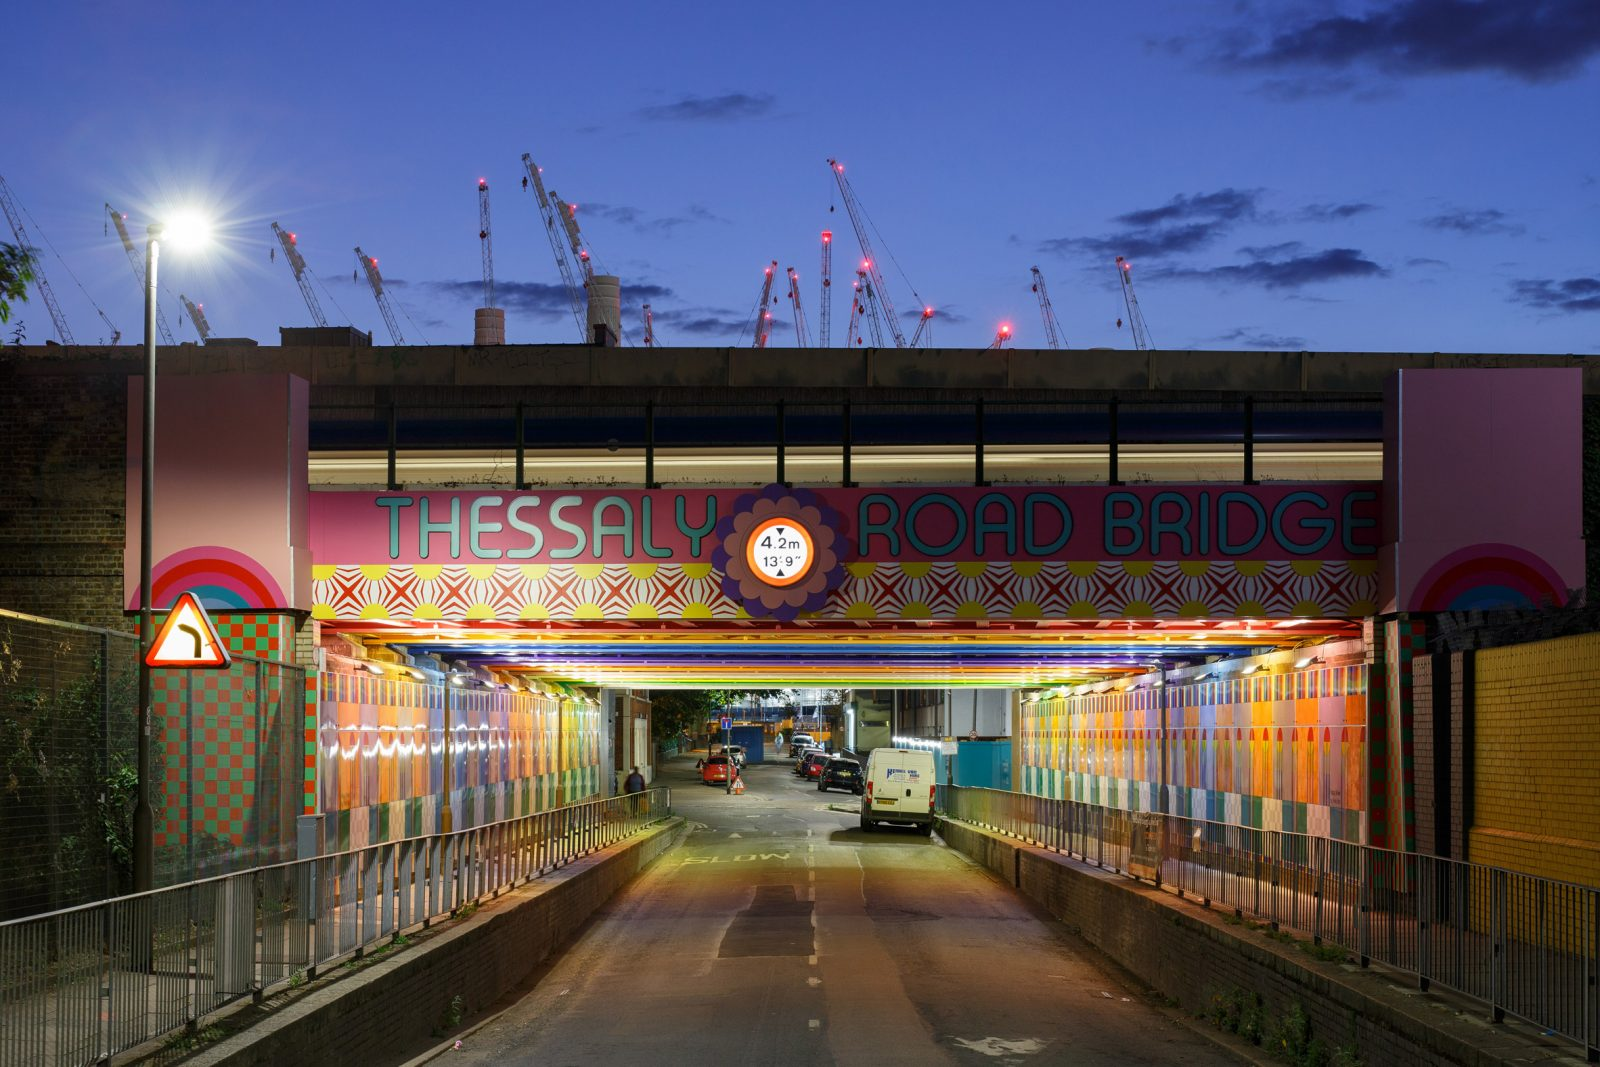 Happy Street by Yinka Illori design installation Thessaly Road Bridge